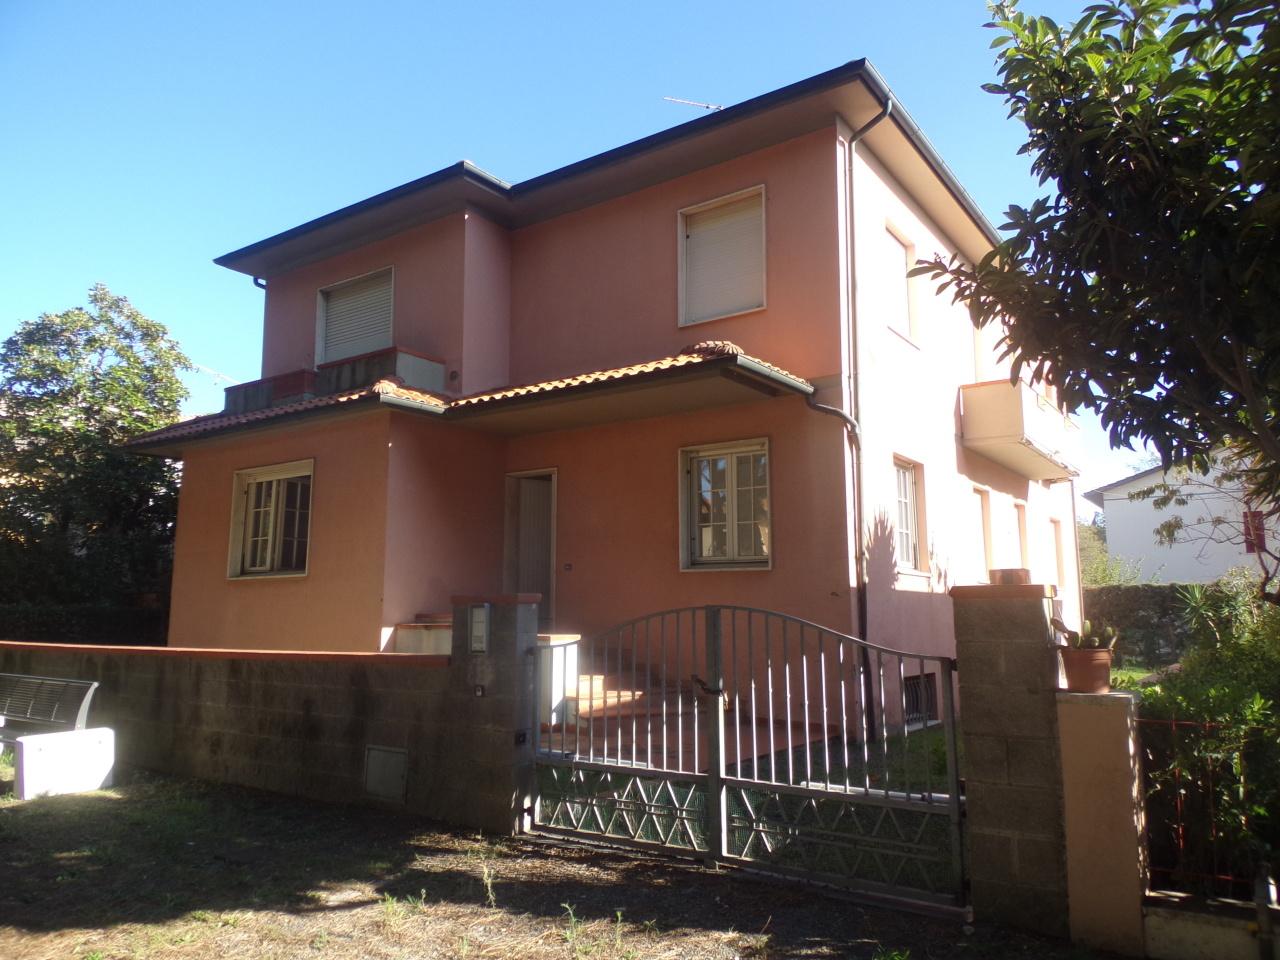 Casa Indipendente in discrete condizioni in vendita Rif. 8638007